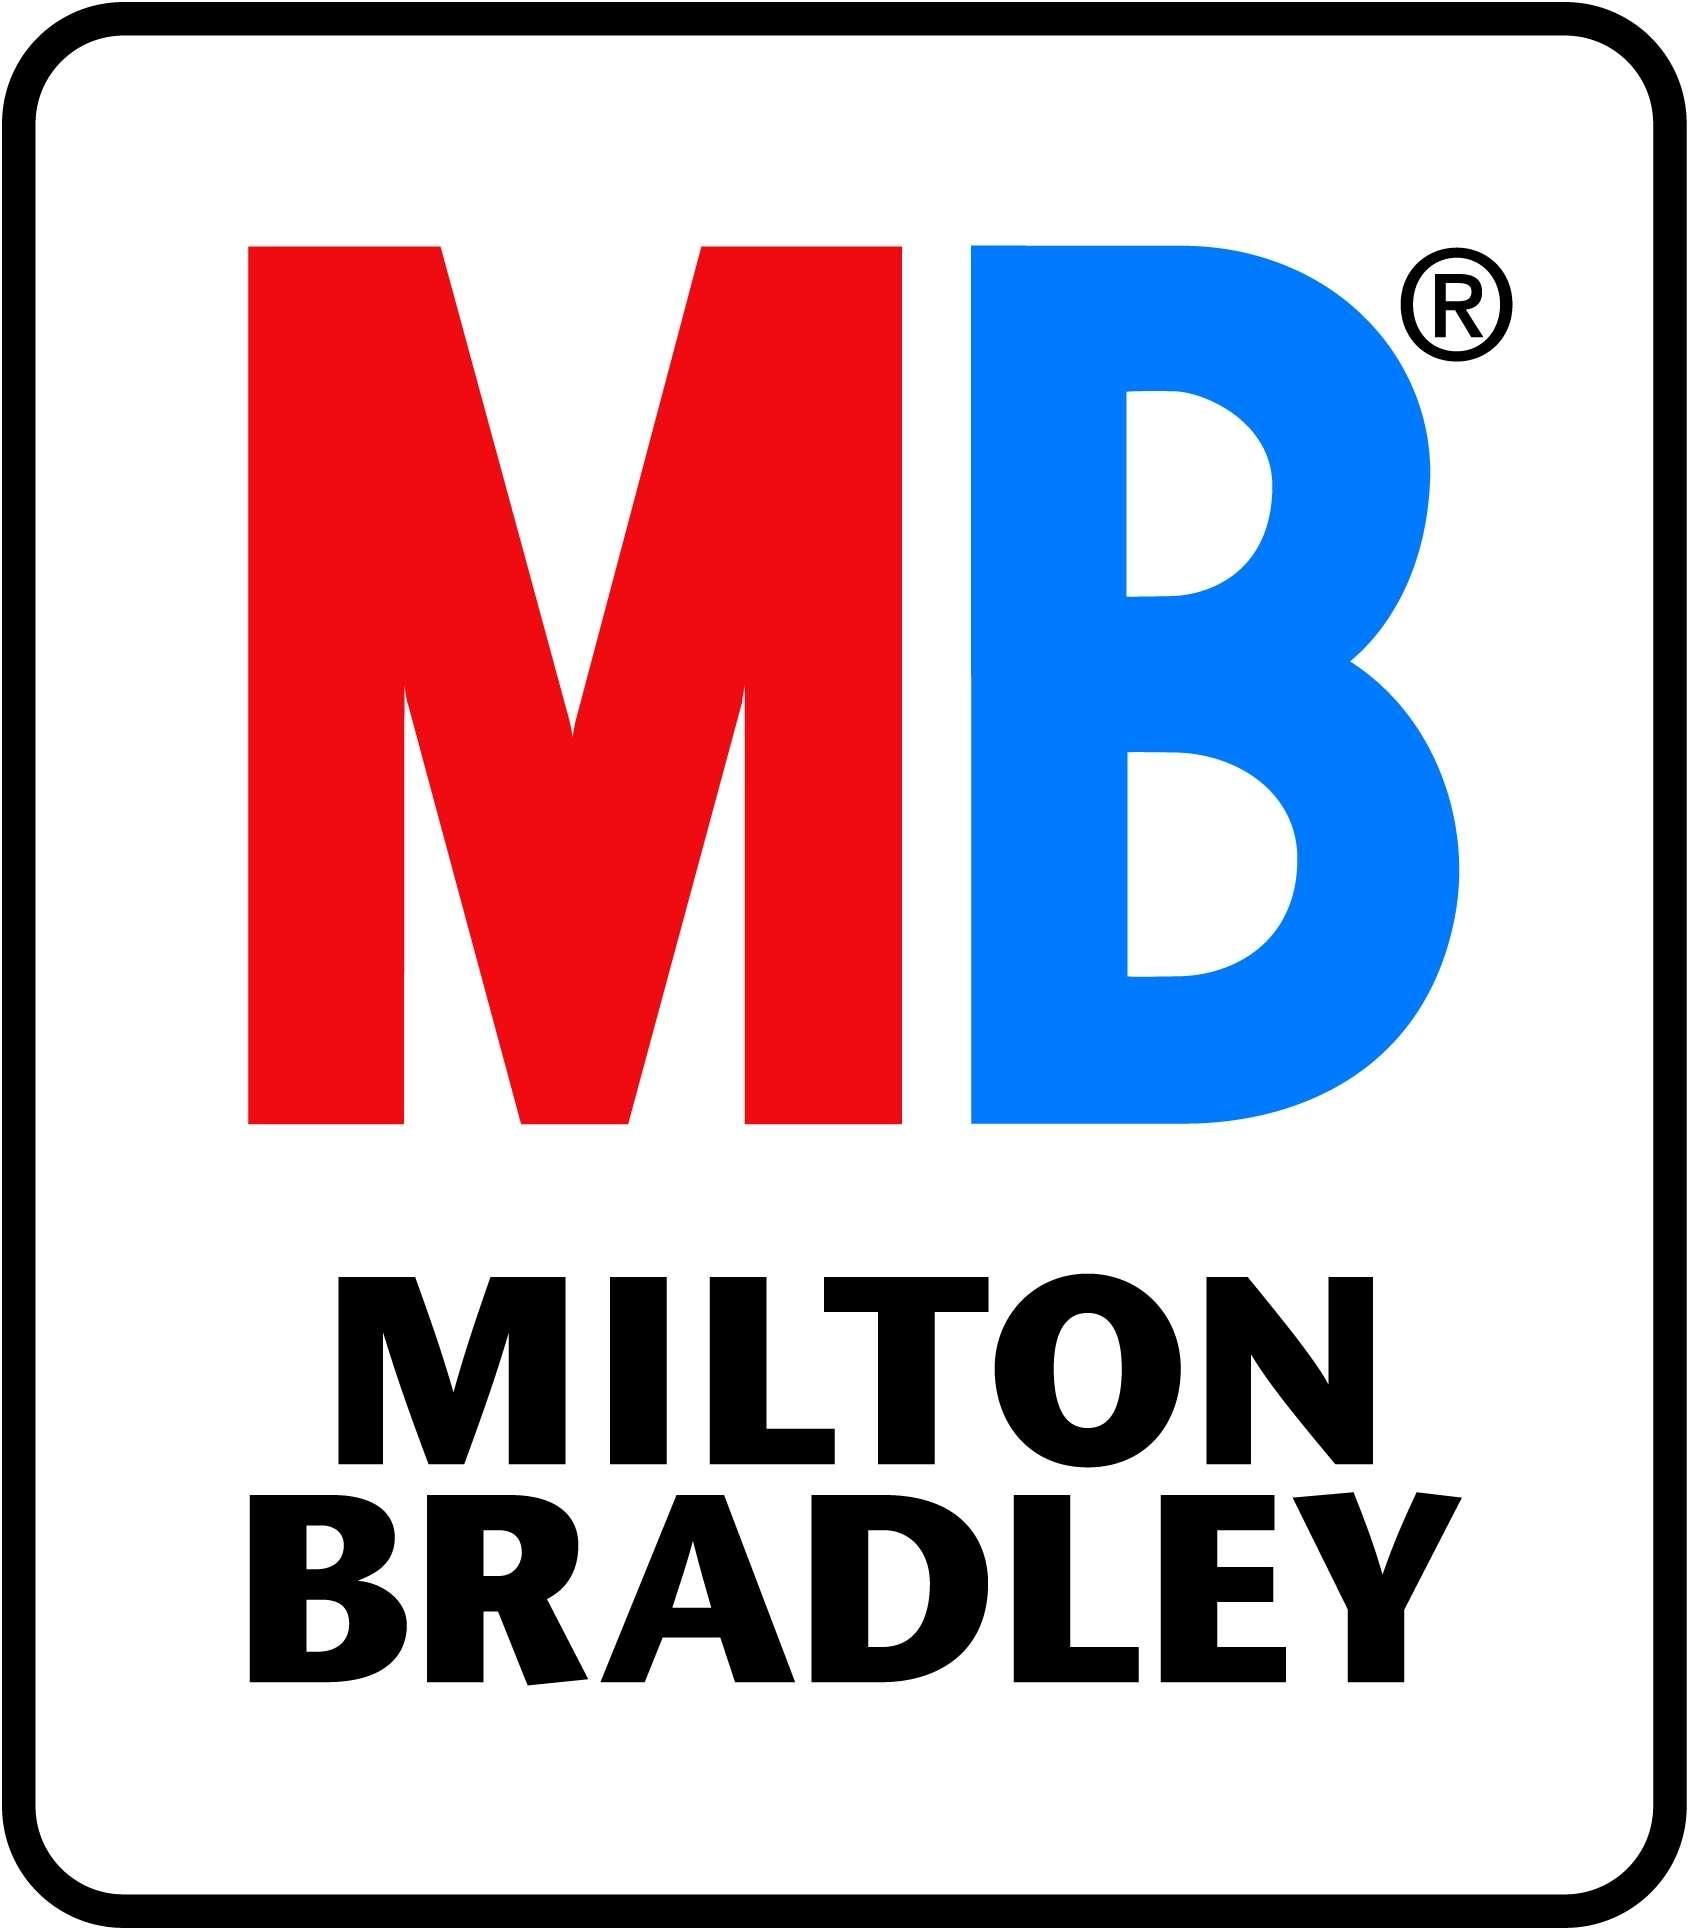 MB-Logo-Milton-Bradley-Company